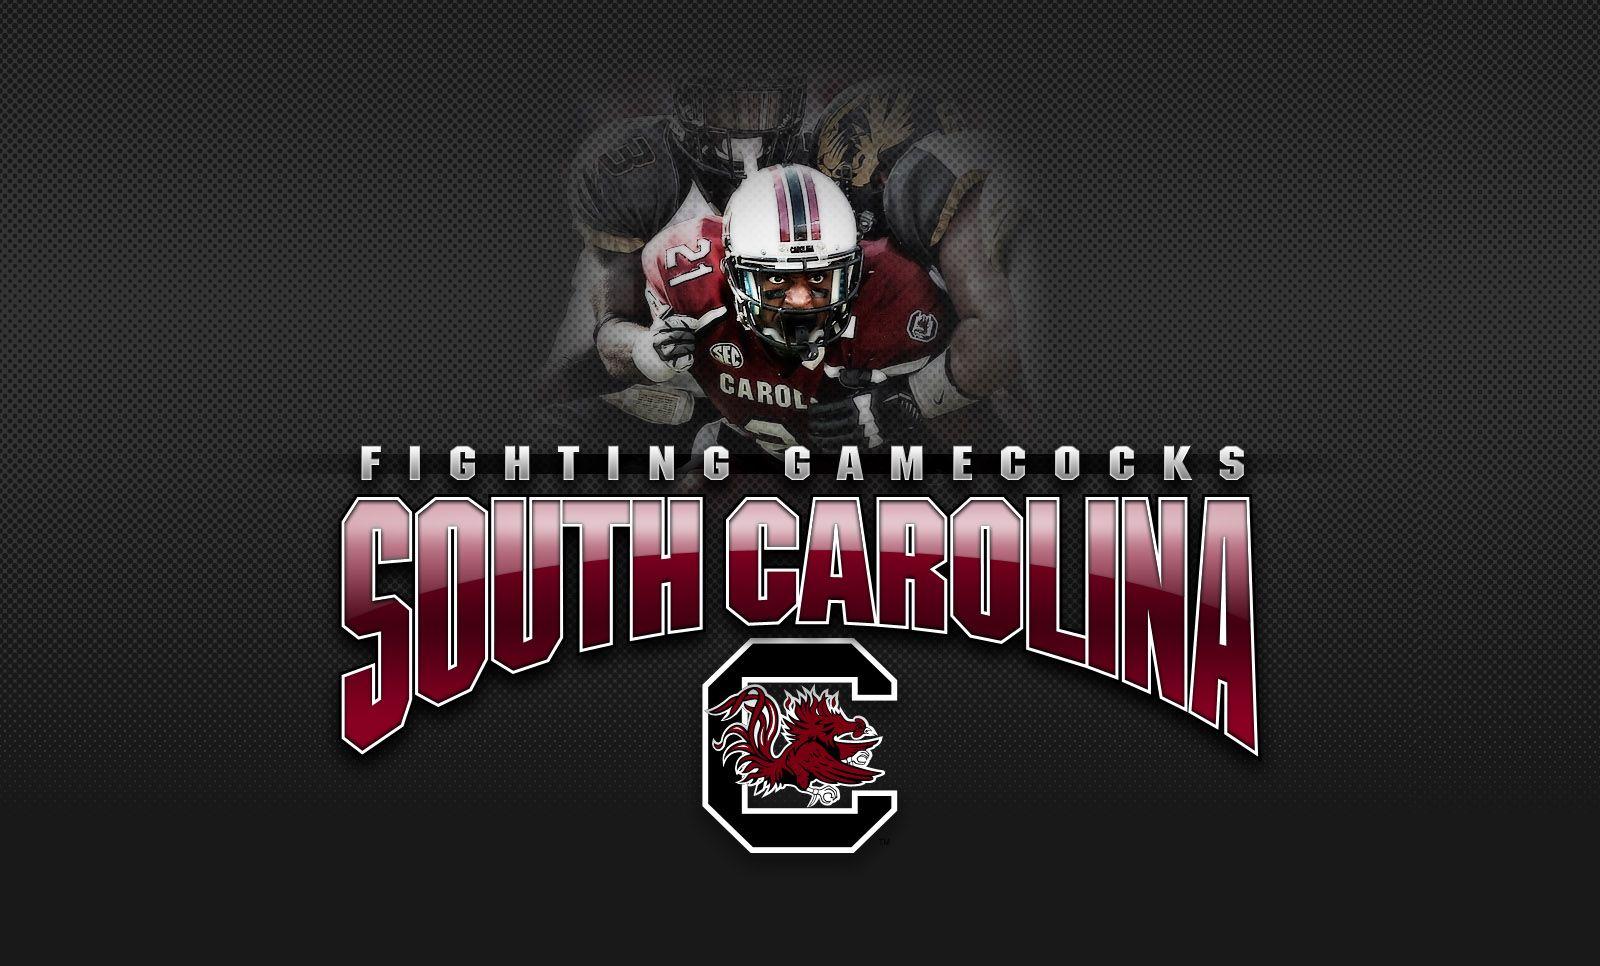 South Carolina Football Screensaver Google Search South